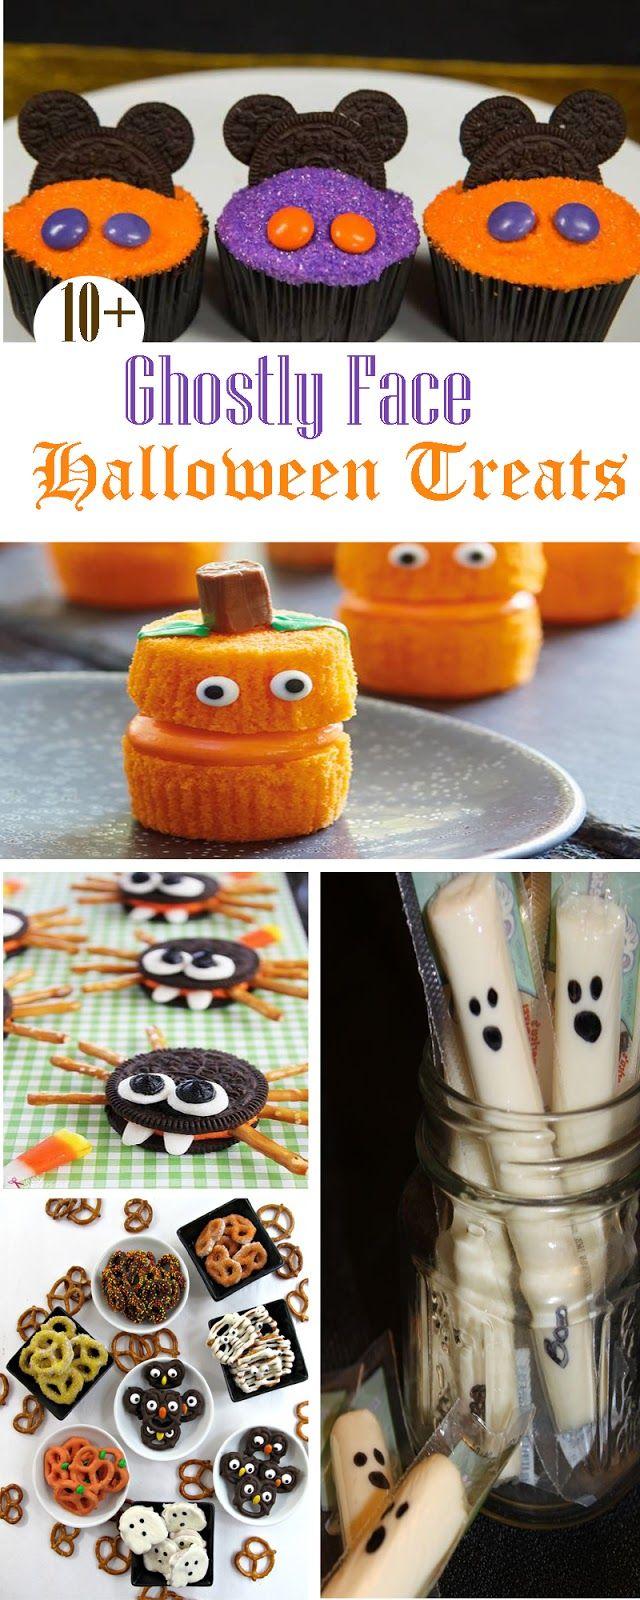 10+ Ghostly Face Halloween Treats